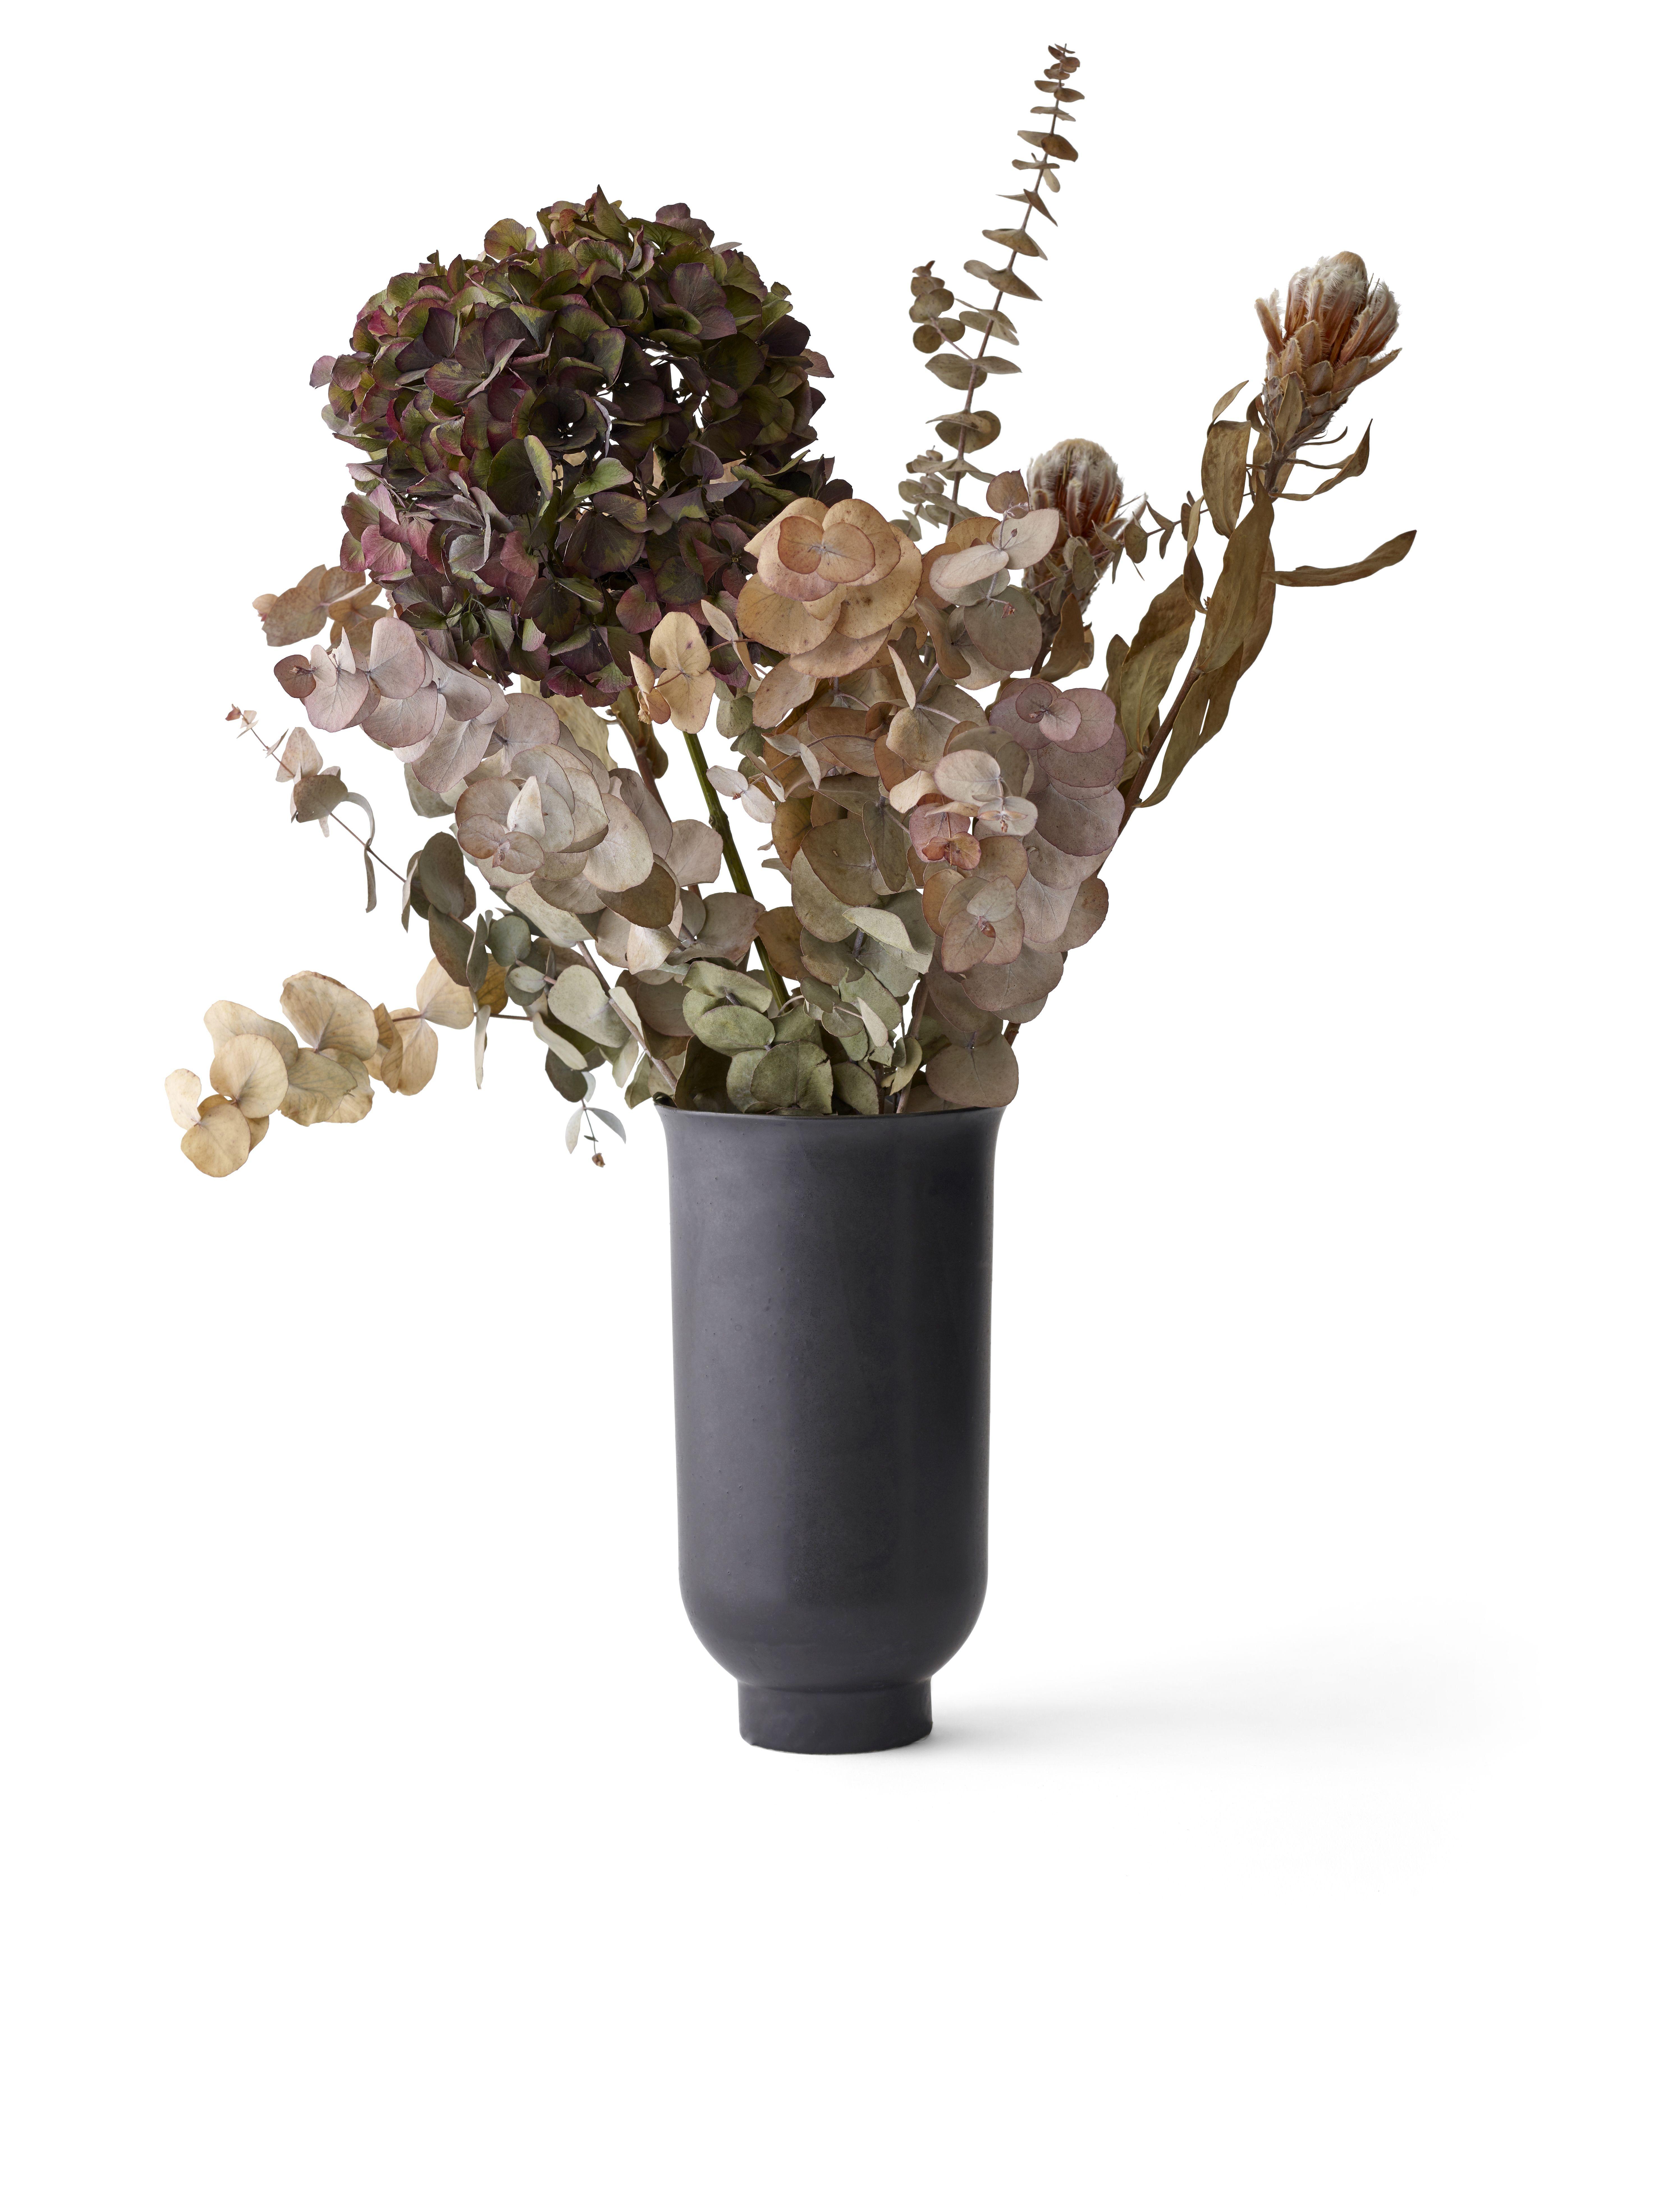 MENU Cyclades Vase in Black (With images) Flower vases